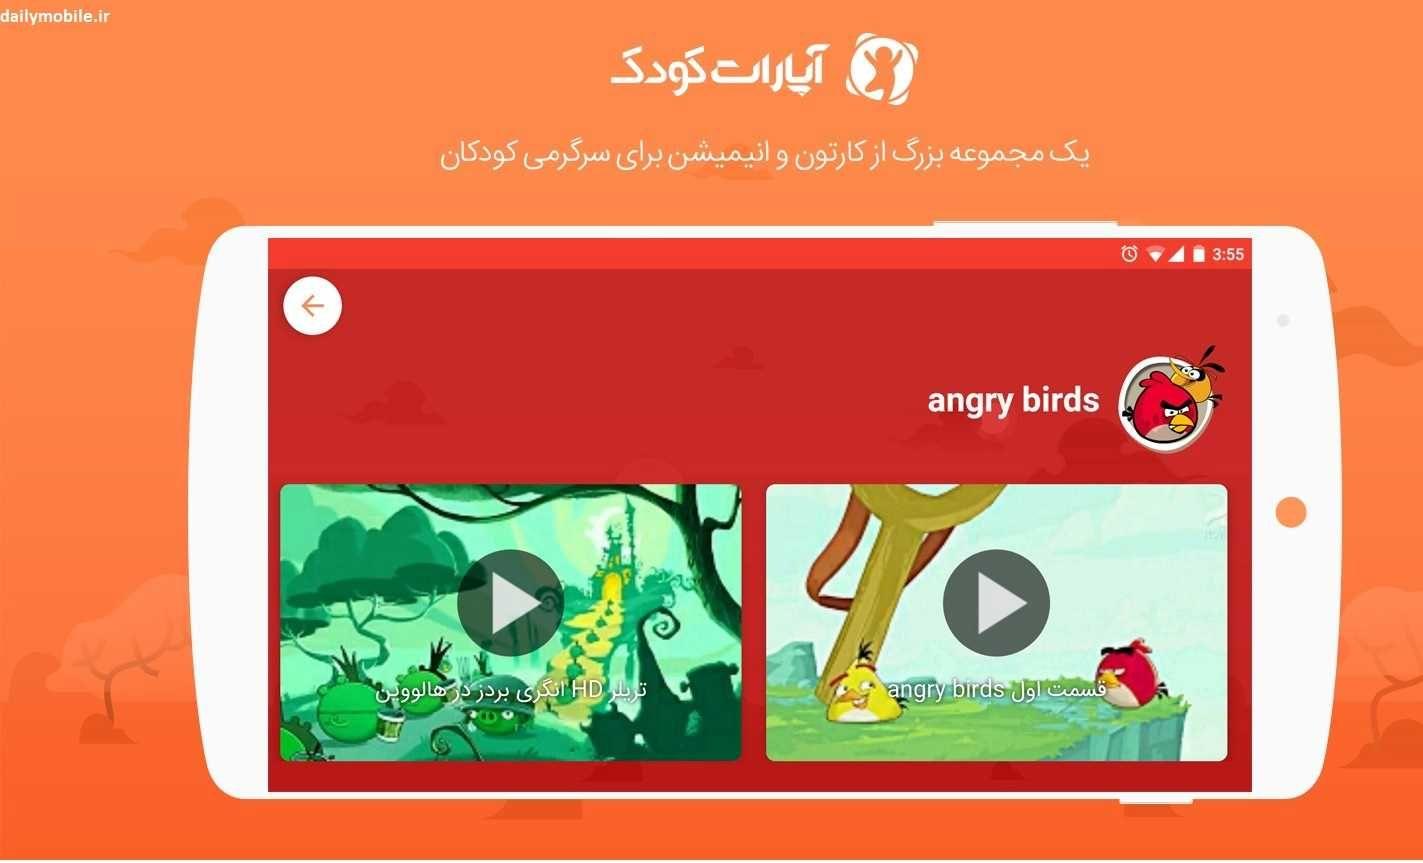 دانلود نسخه جدید برنامه آپارت کودک اندروید Aparat Kids با لینک مستقیم Kids Fictional Characters Character